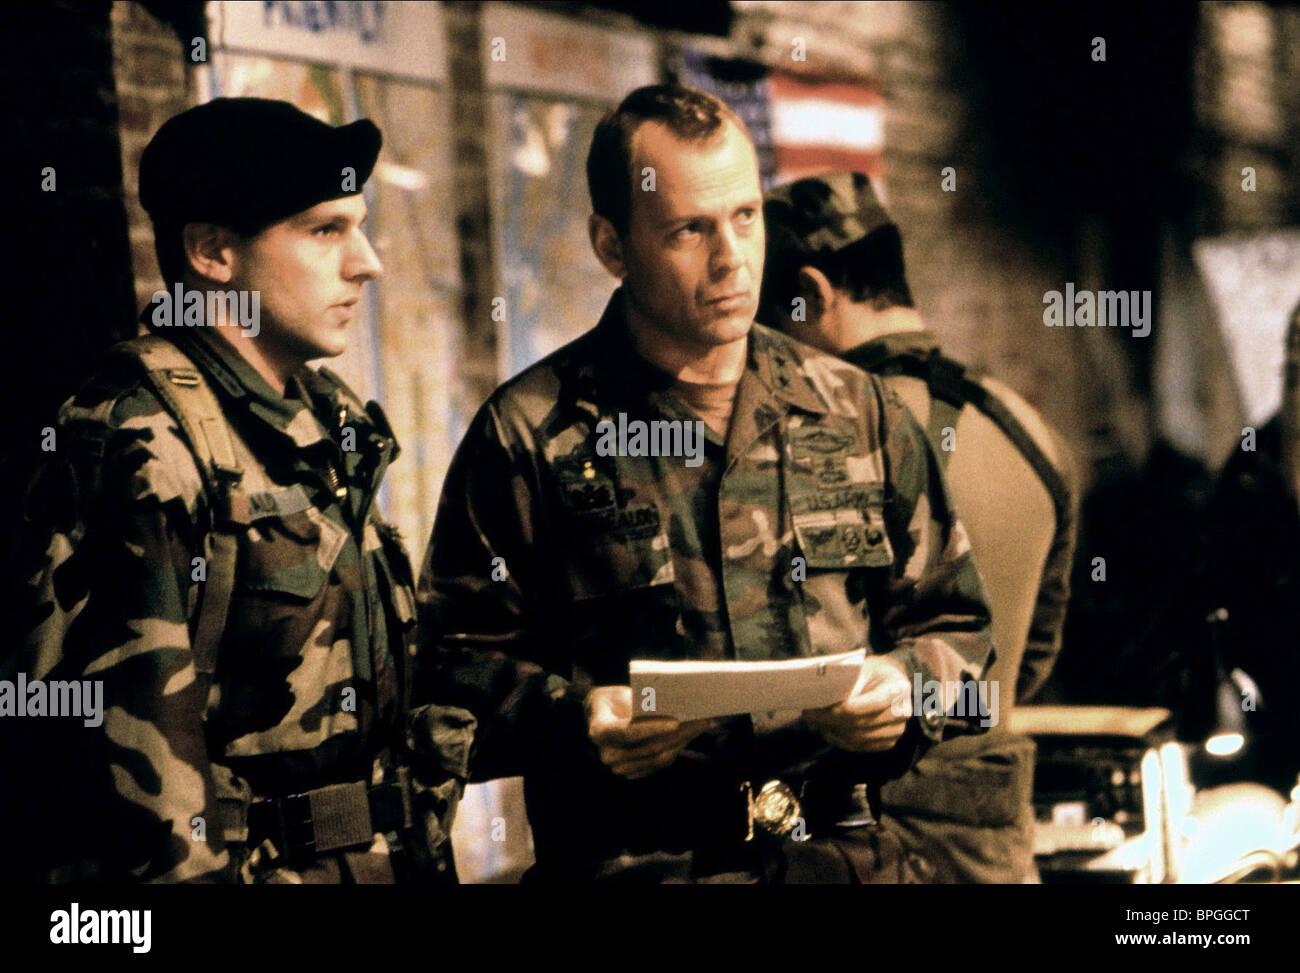 BRUCE WILLIS THE SIEGE (1998) - Stock Image